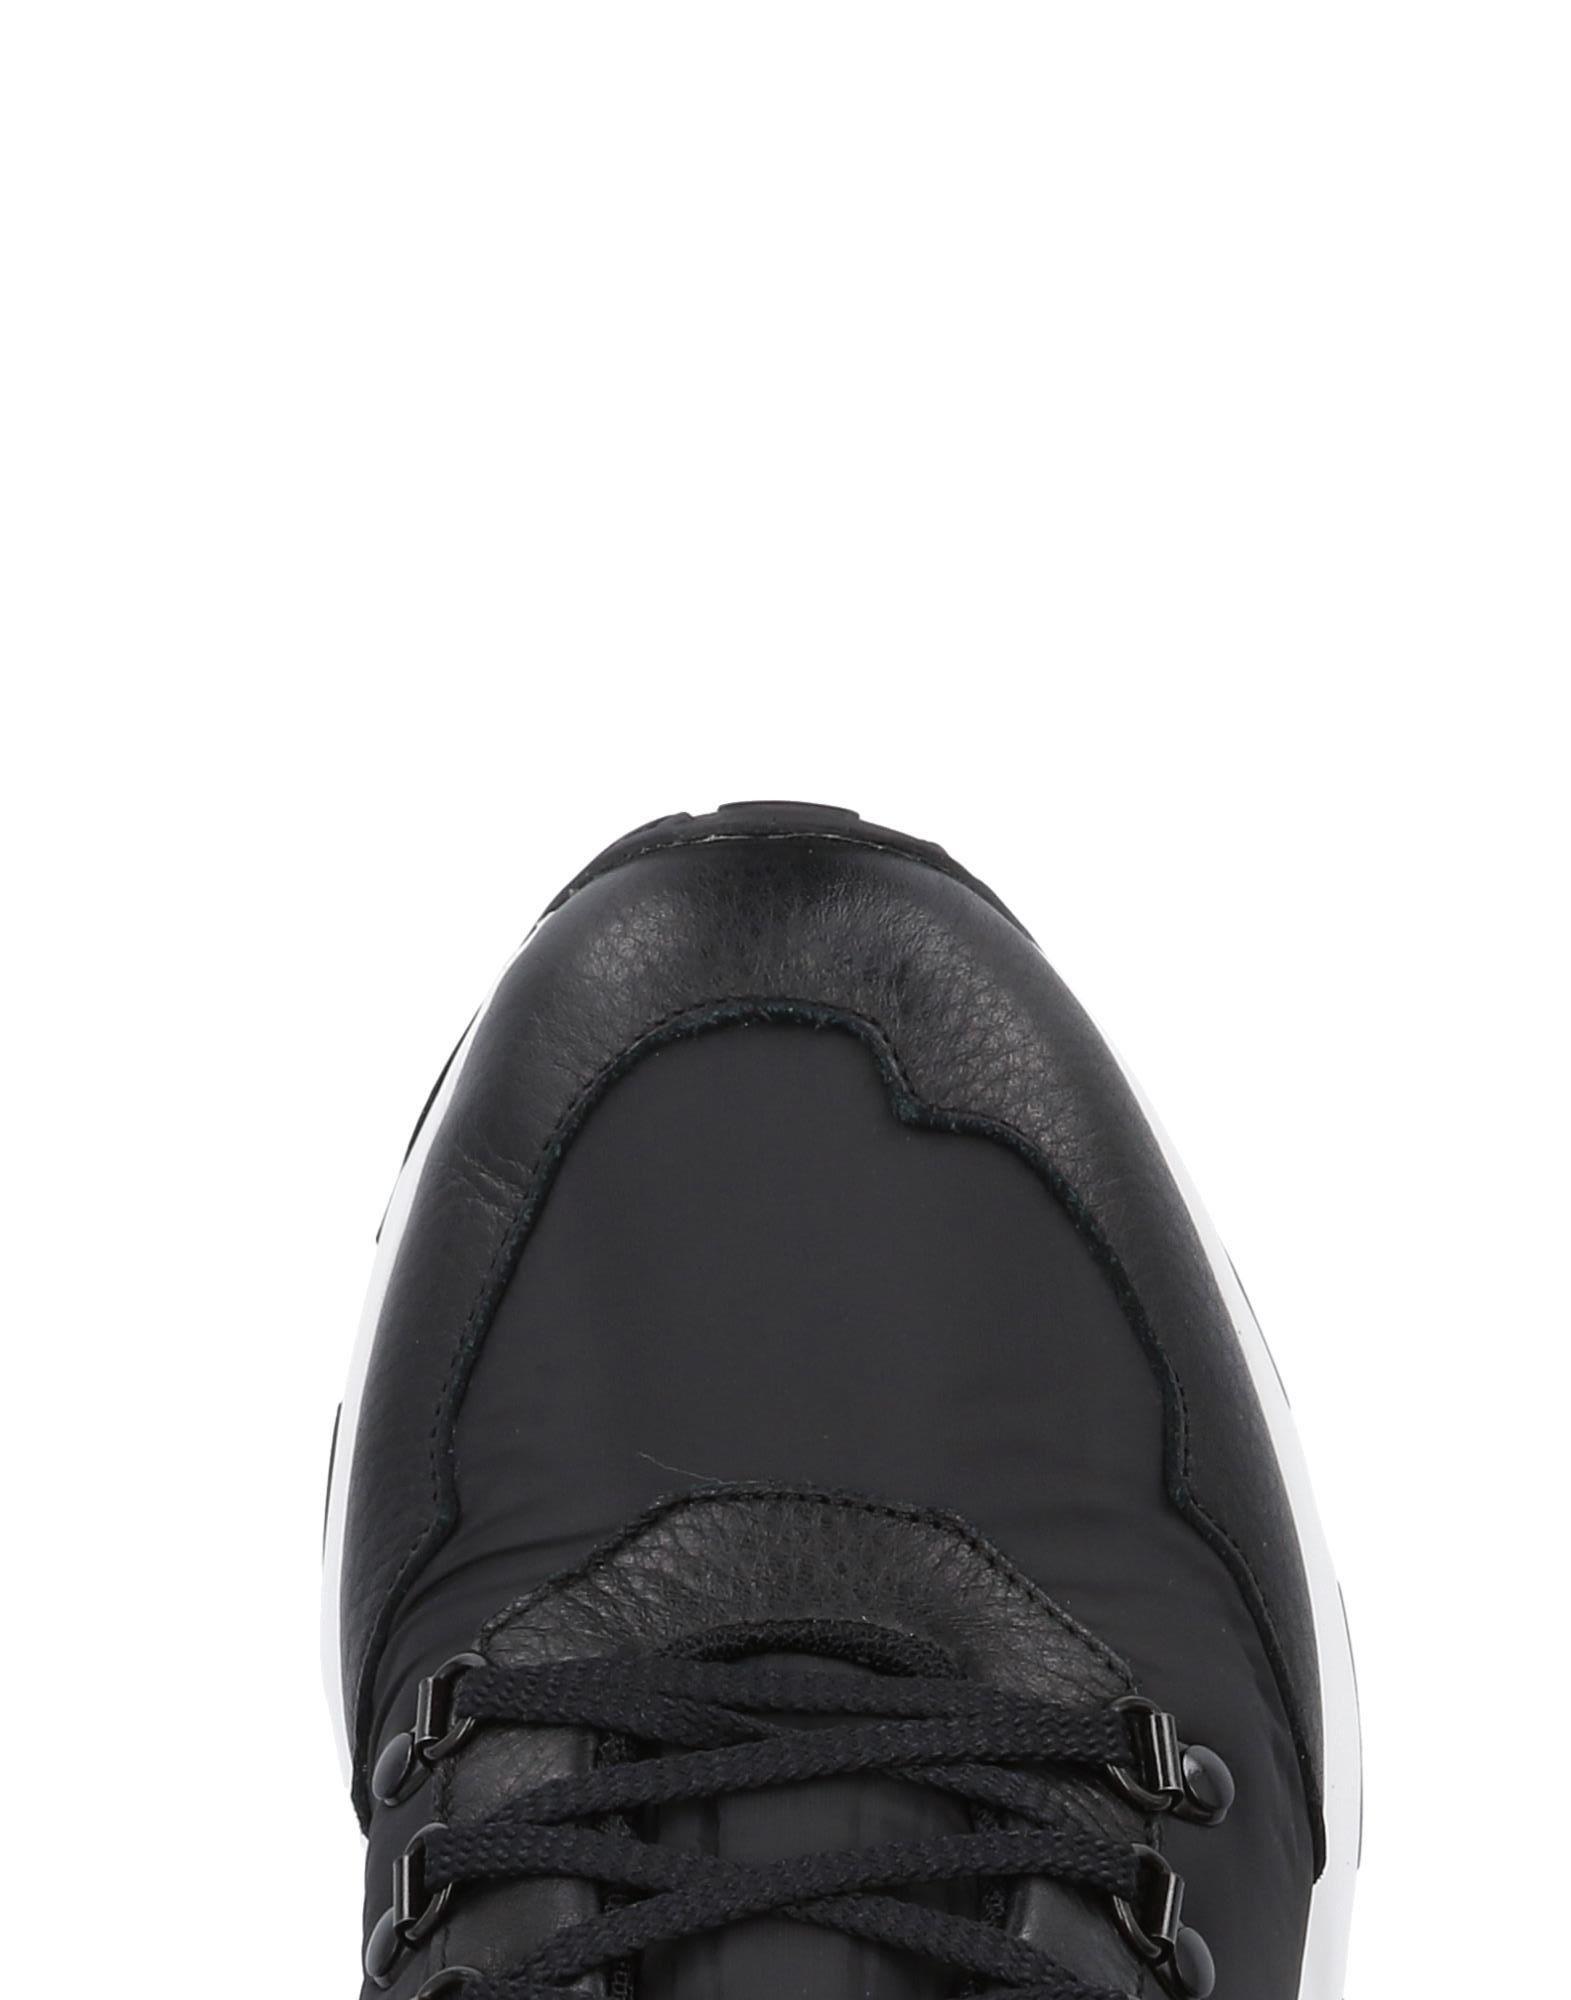 Stilvolle billige Schuhe Damen Ruco Line Sneakers Damen Schuhe  11469367BT 6142e4